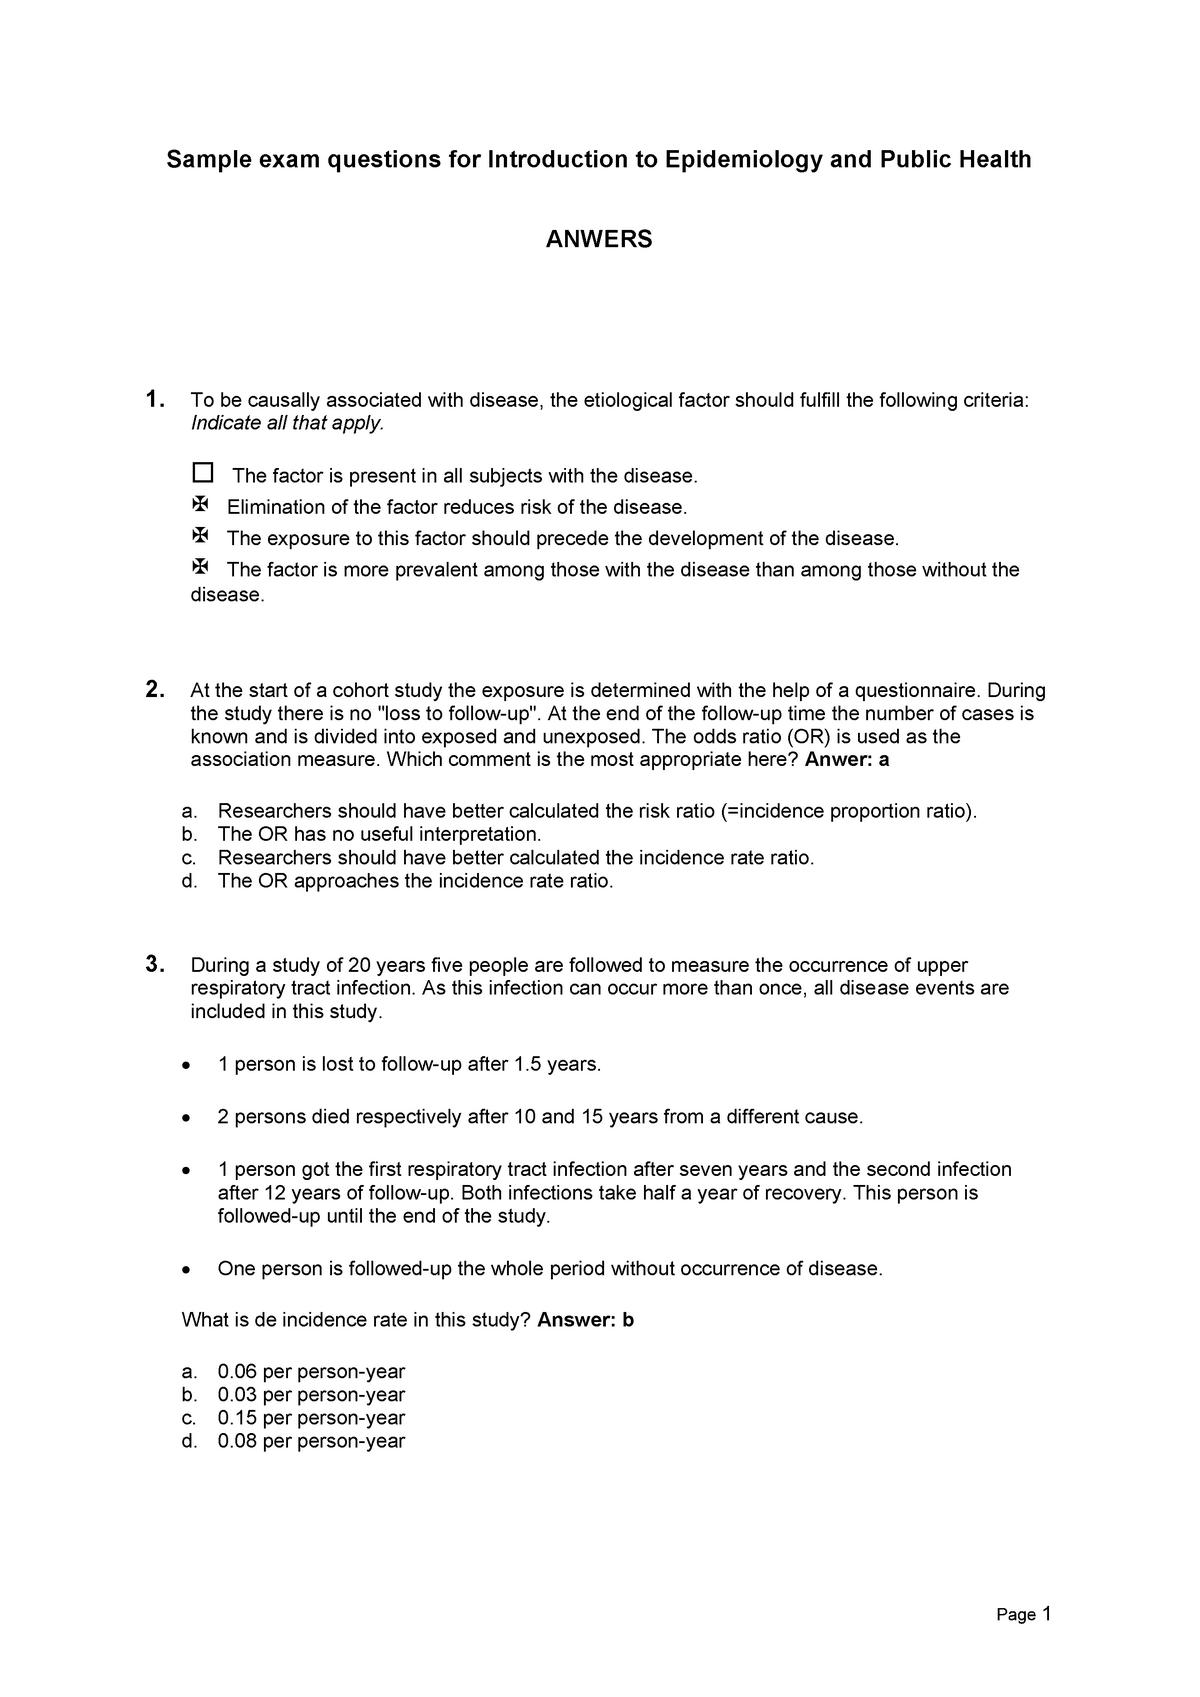 Exam answers - HNE-24806 - Wageningen University - StuDocu